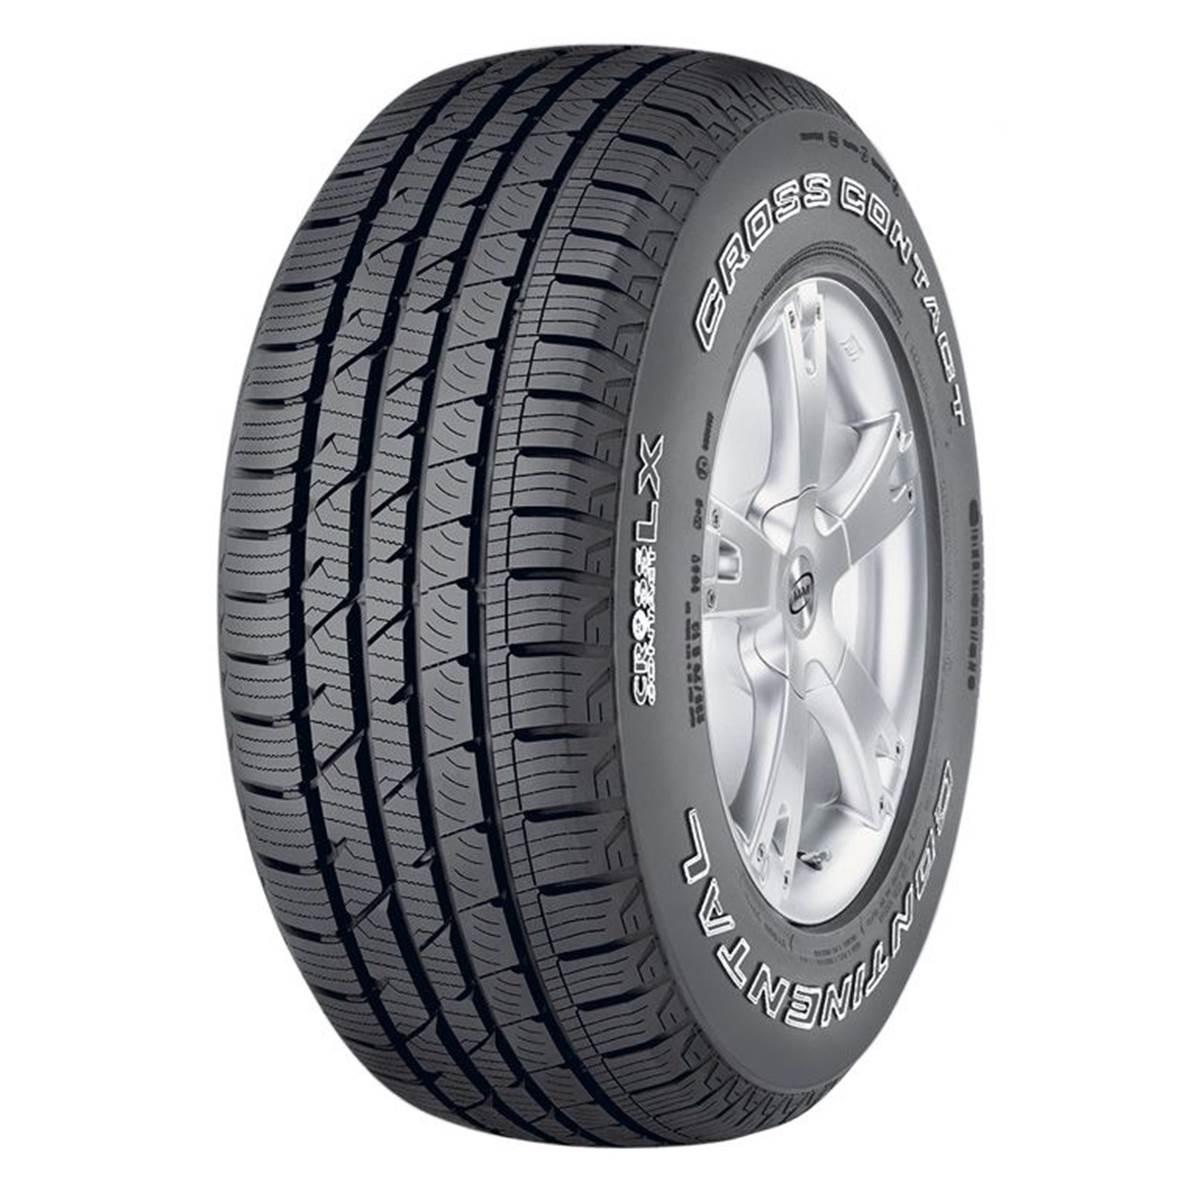 achat pneu continental conti crosscontact lx 215 65 r16 98h pas cher. Black Bedroom Furniture Sets. Home Design Ideas